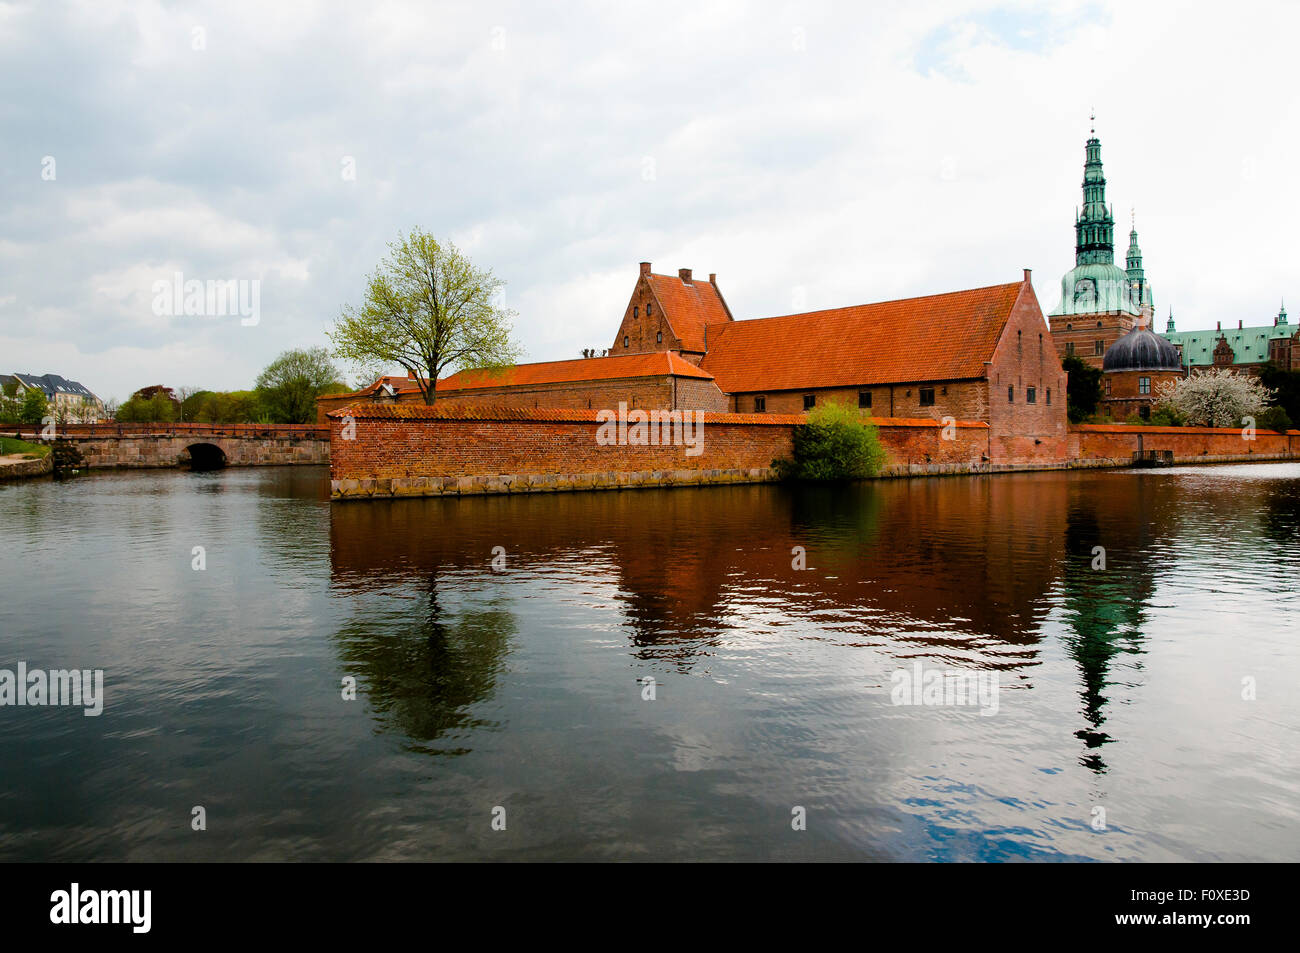 Palace Lake of Frederiksborg Castle - Hillerod - Denmark - Stock Image